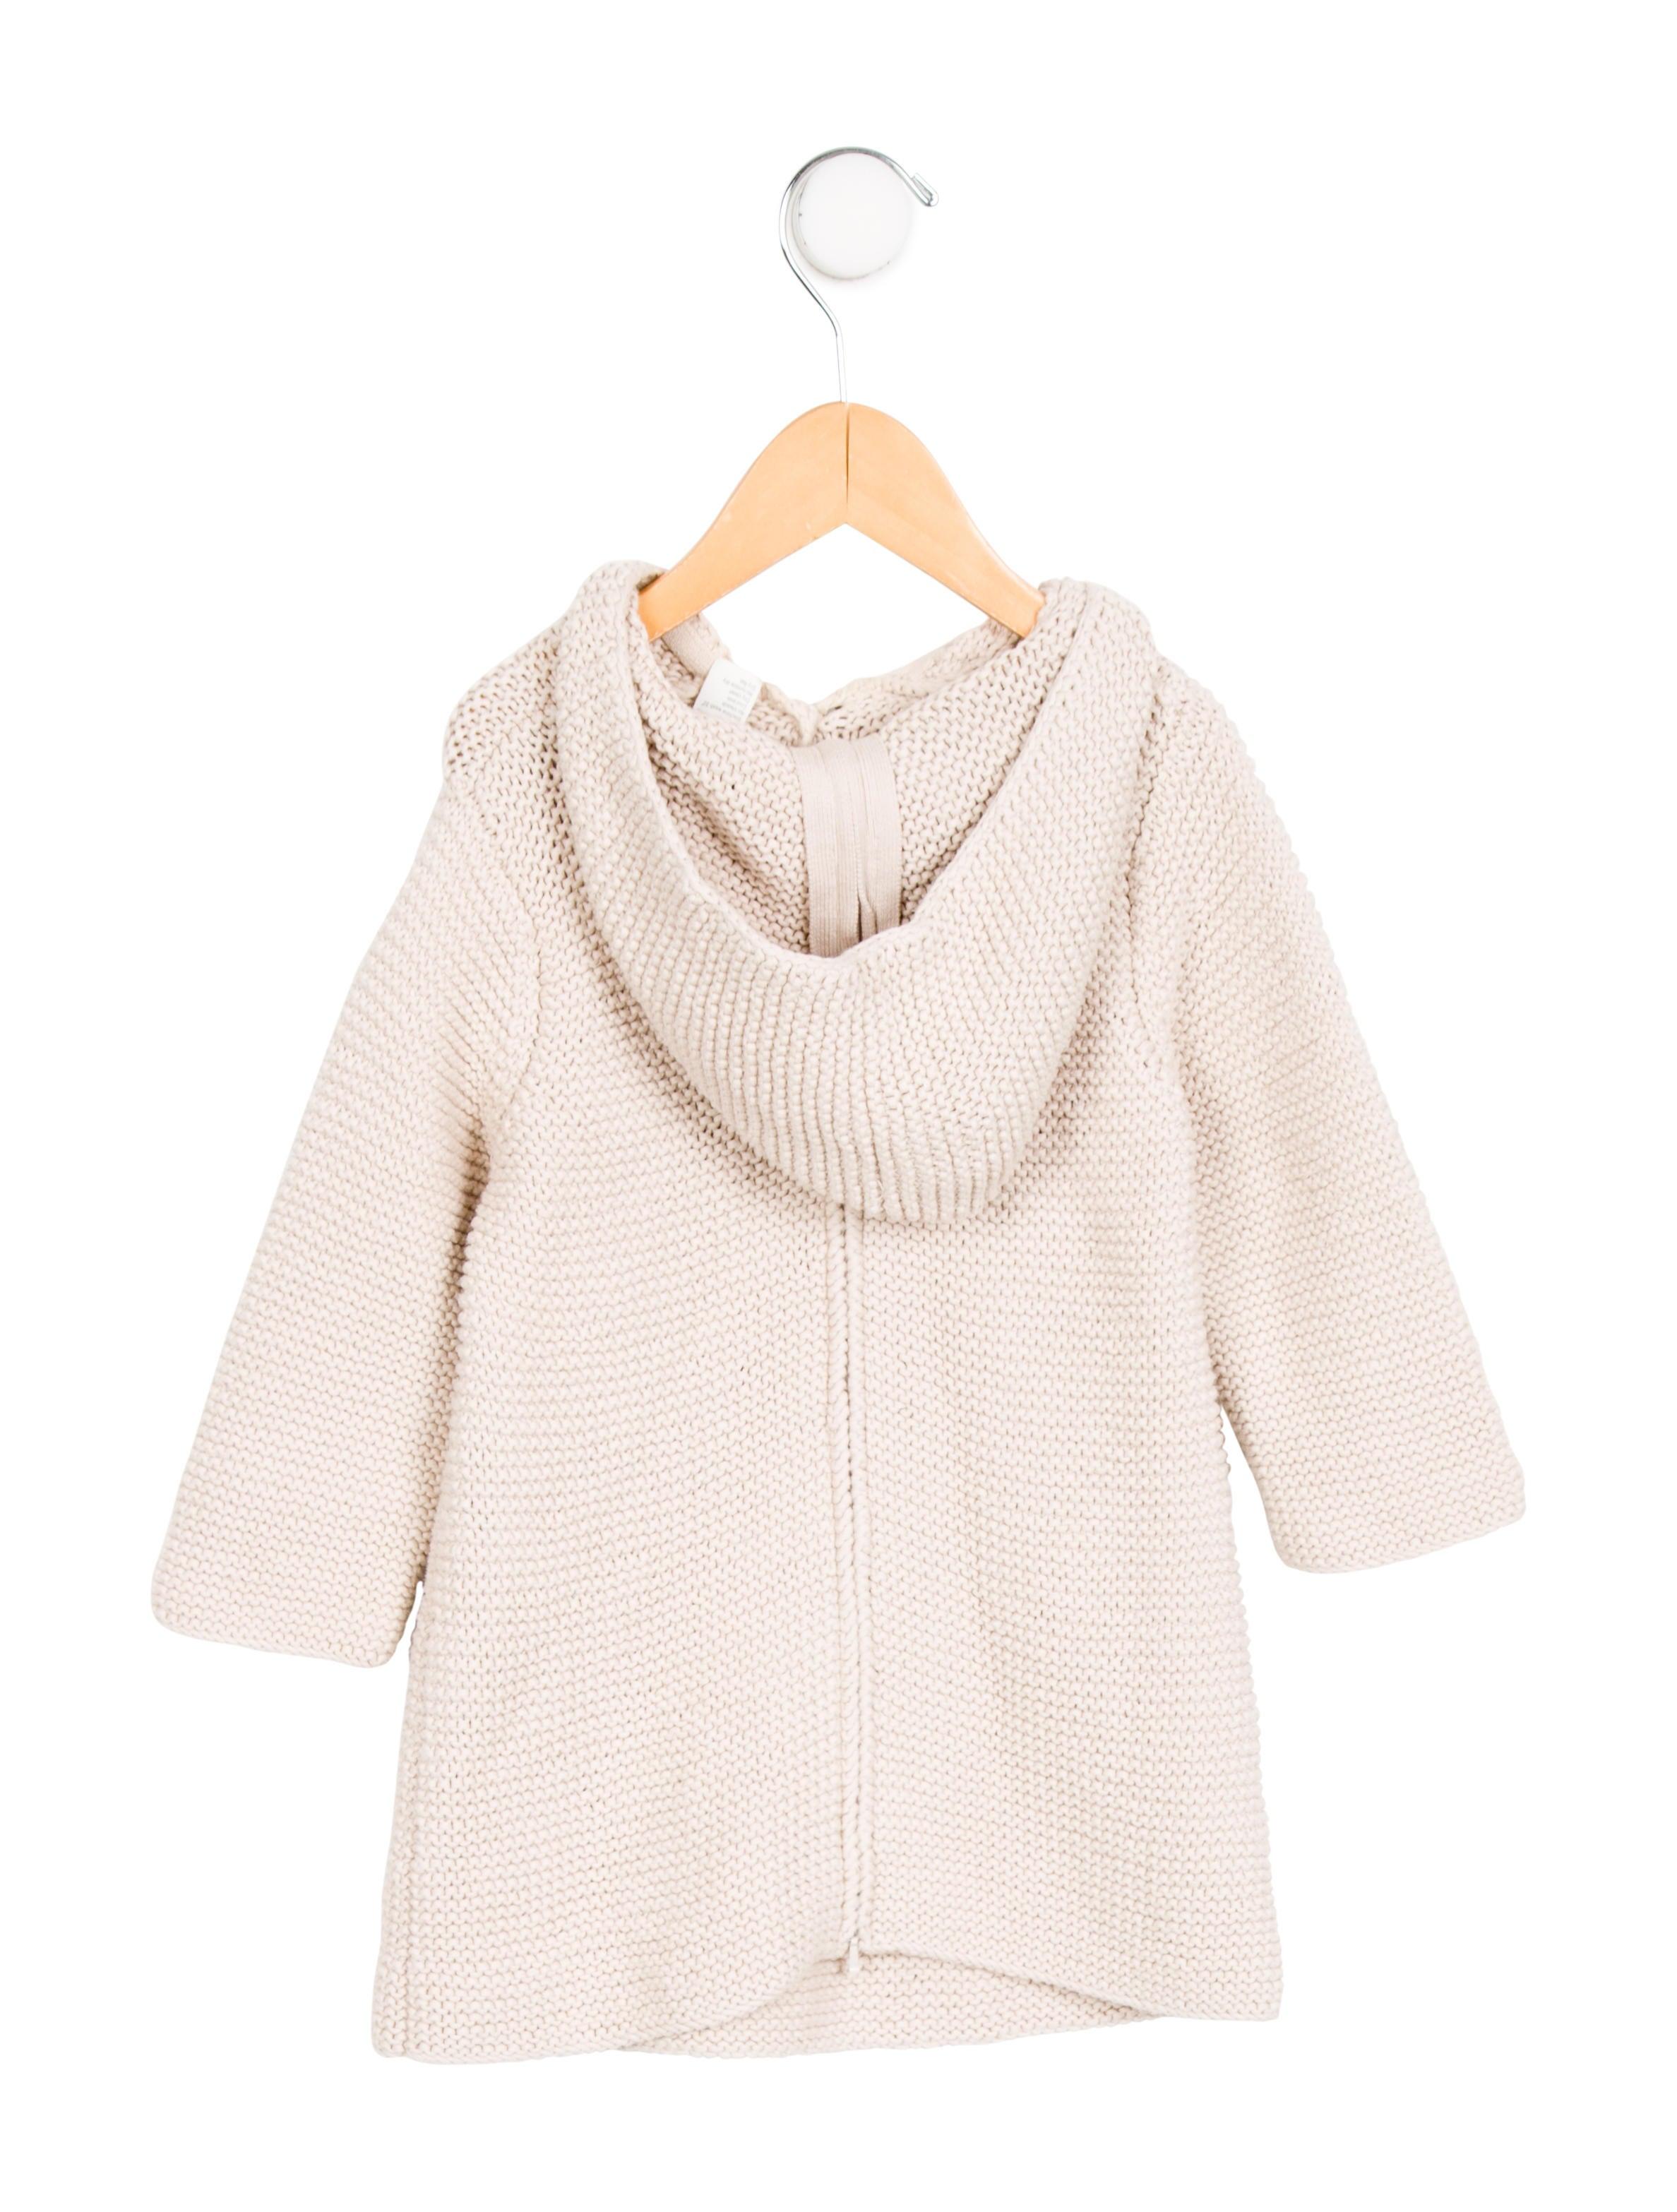 Bonpoint Girls Hooded Knit Dress - Girls - WBONP24778 ...